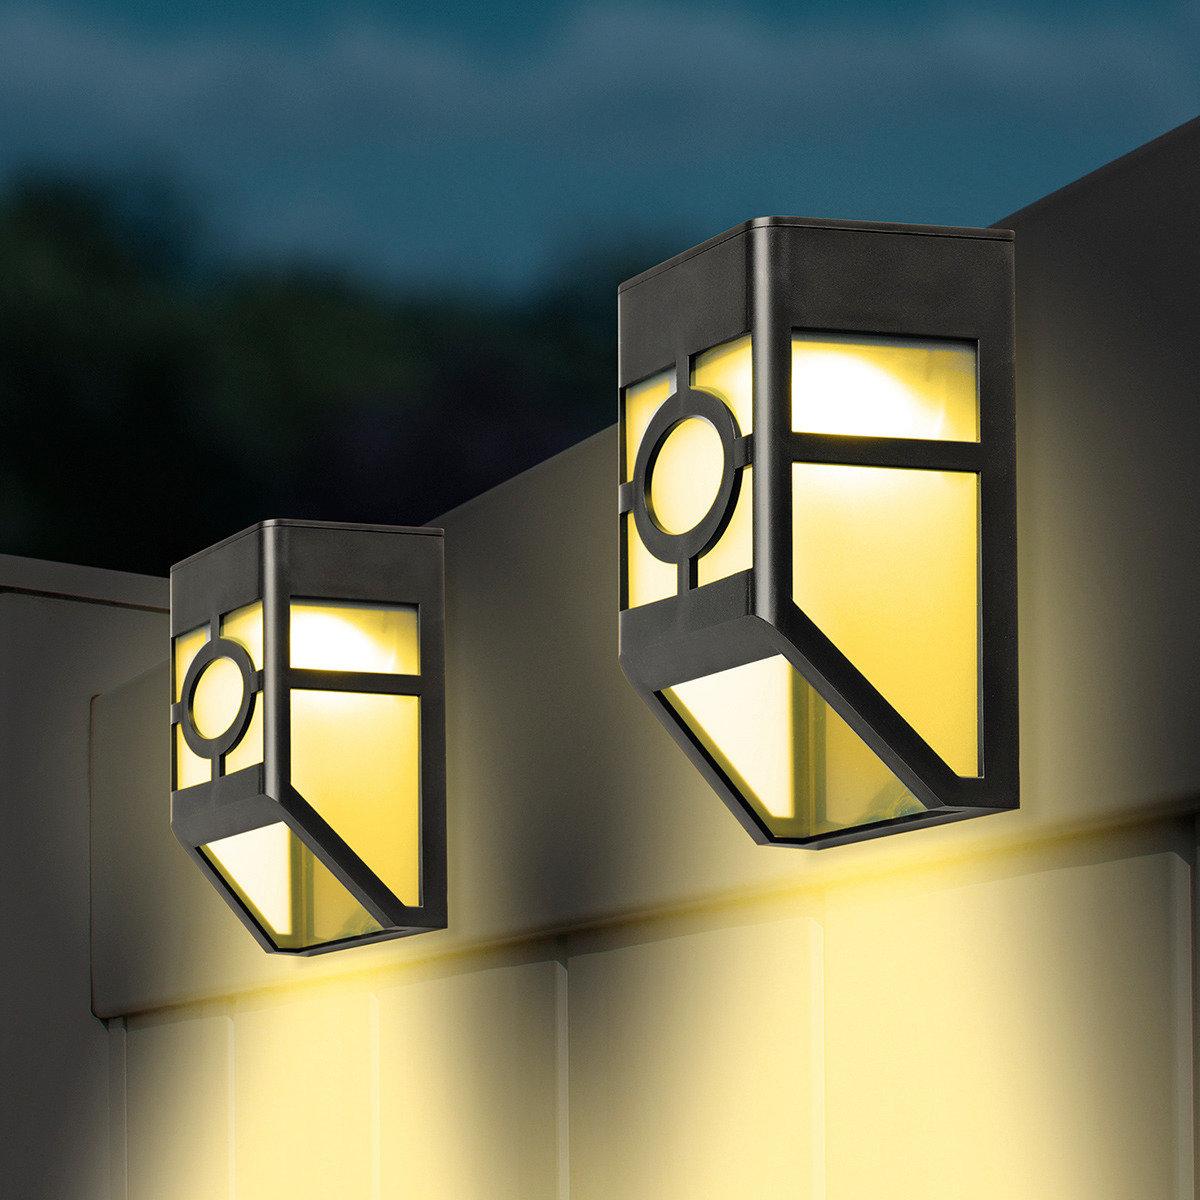 Solar zaunlichter 2er set von g rtner p tschke for Gartendeko neuheiten